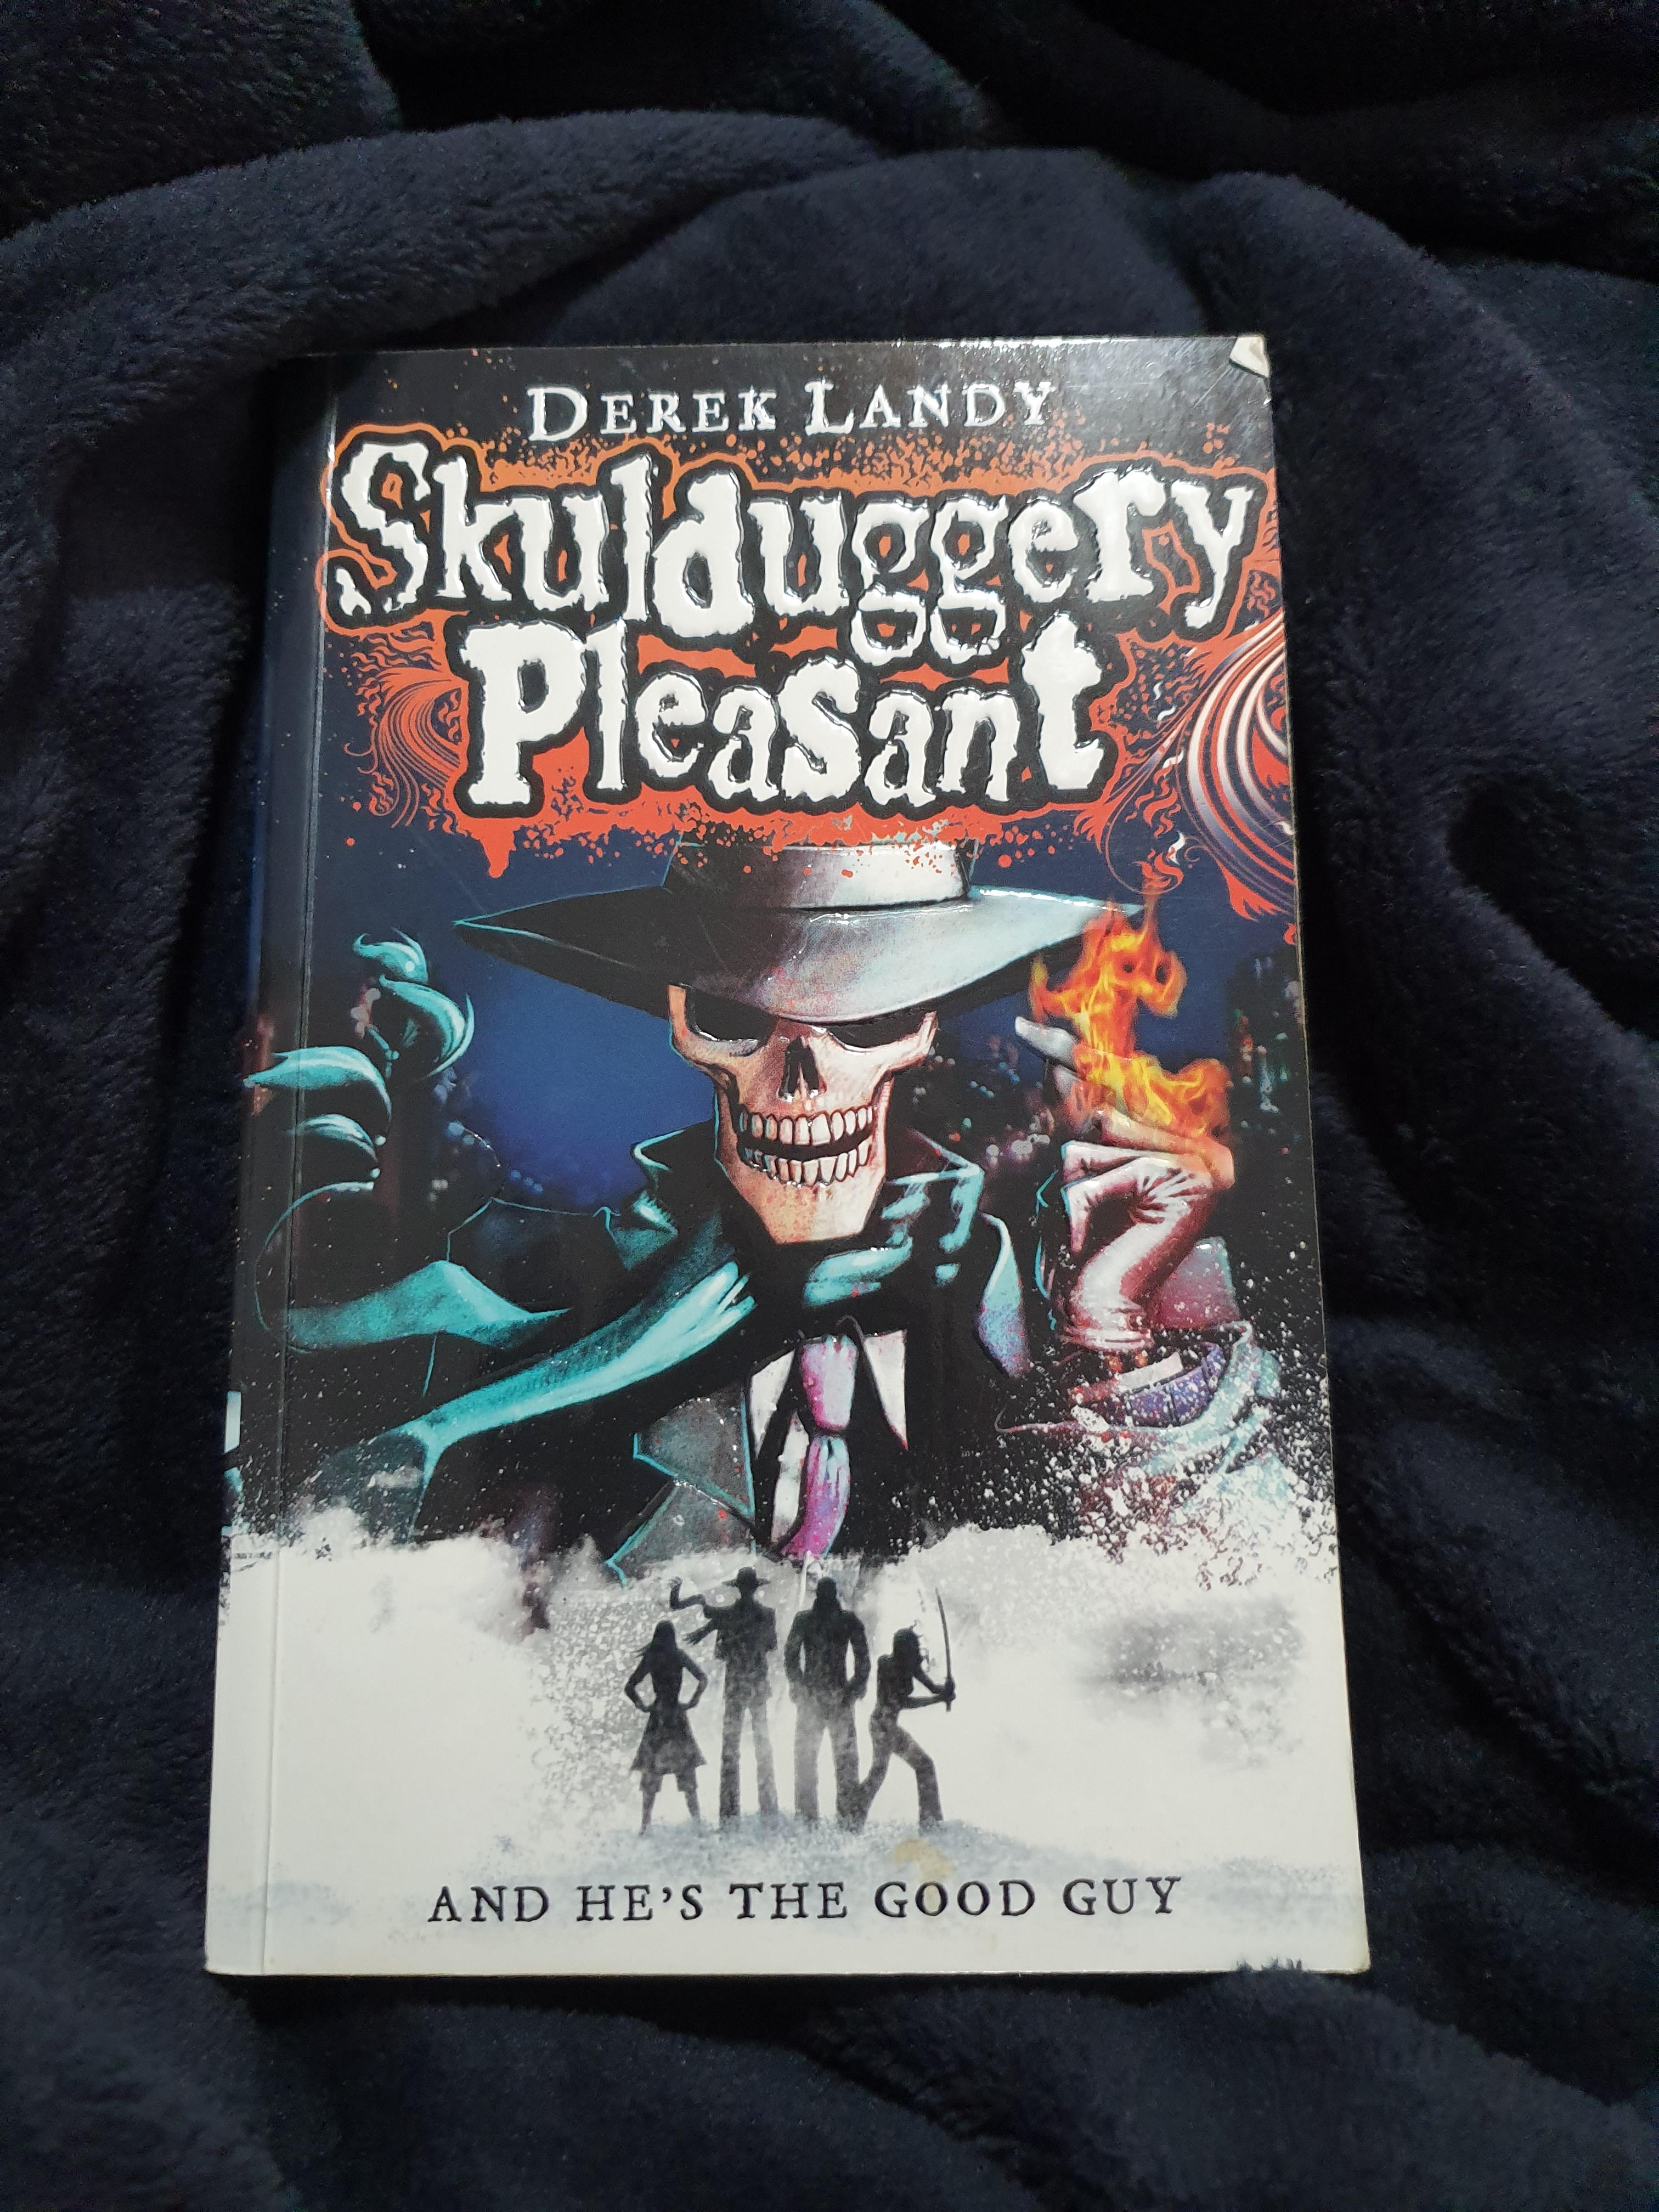 Skulduggery Pleasant by Derek Landy (1)